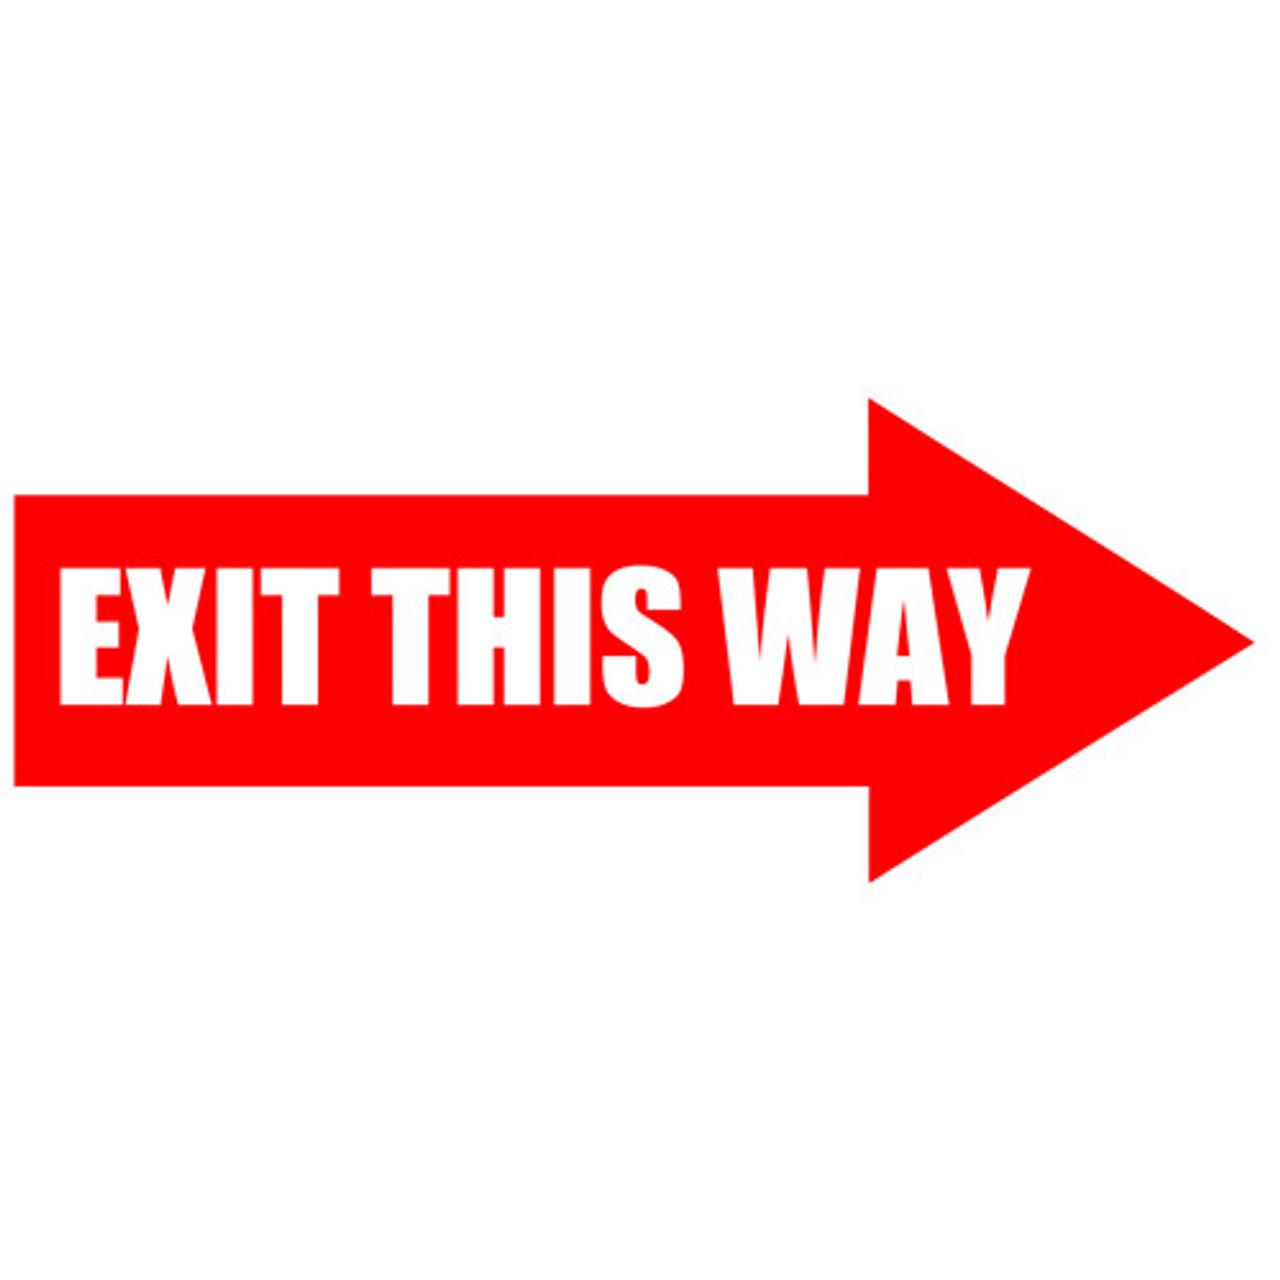 Exit This Way Arrow Sign - 5stoday.com 866-402-4776